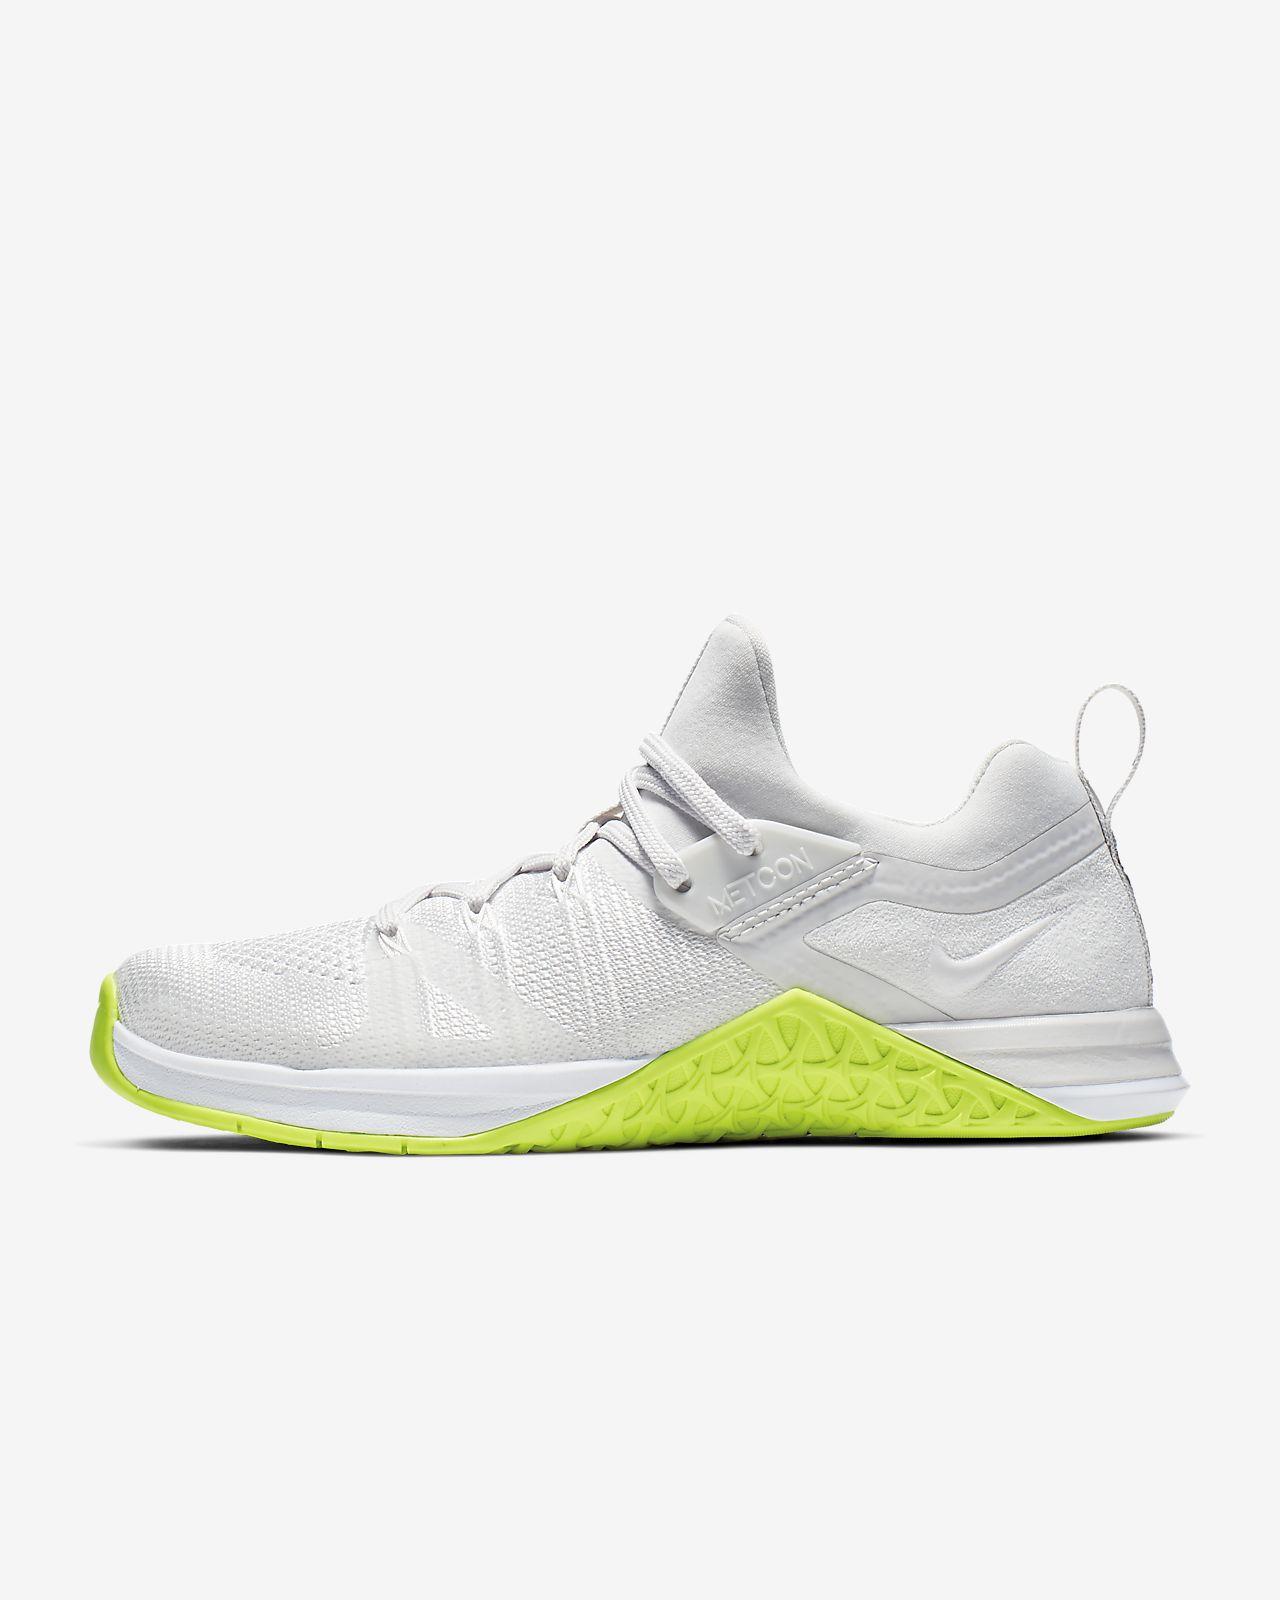 Nike 3 Pesi Scarpa Cross Metcon Da Trainingsollevamento Flyknit VLSqzpUMG